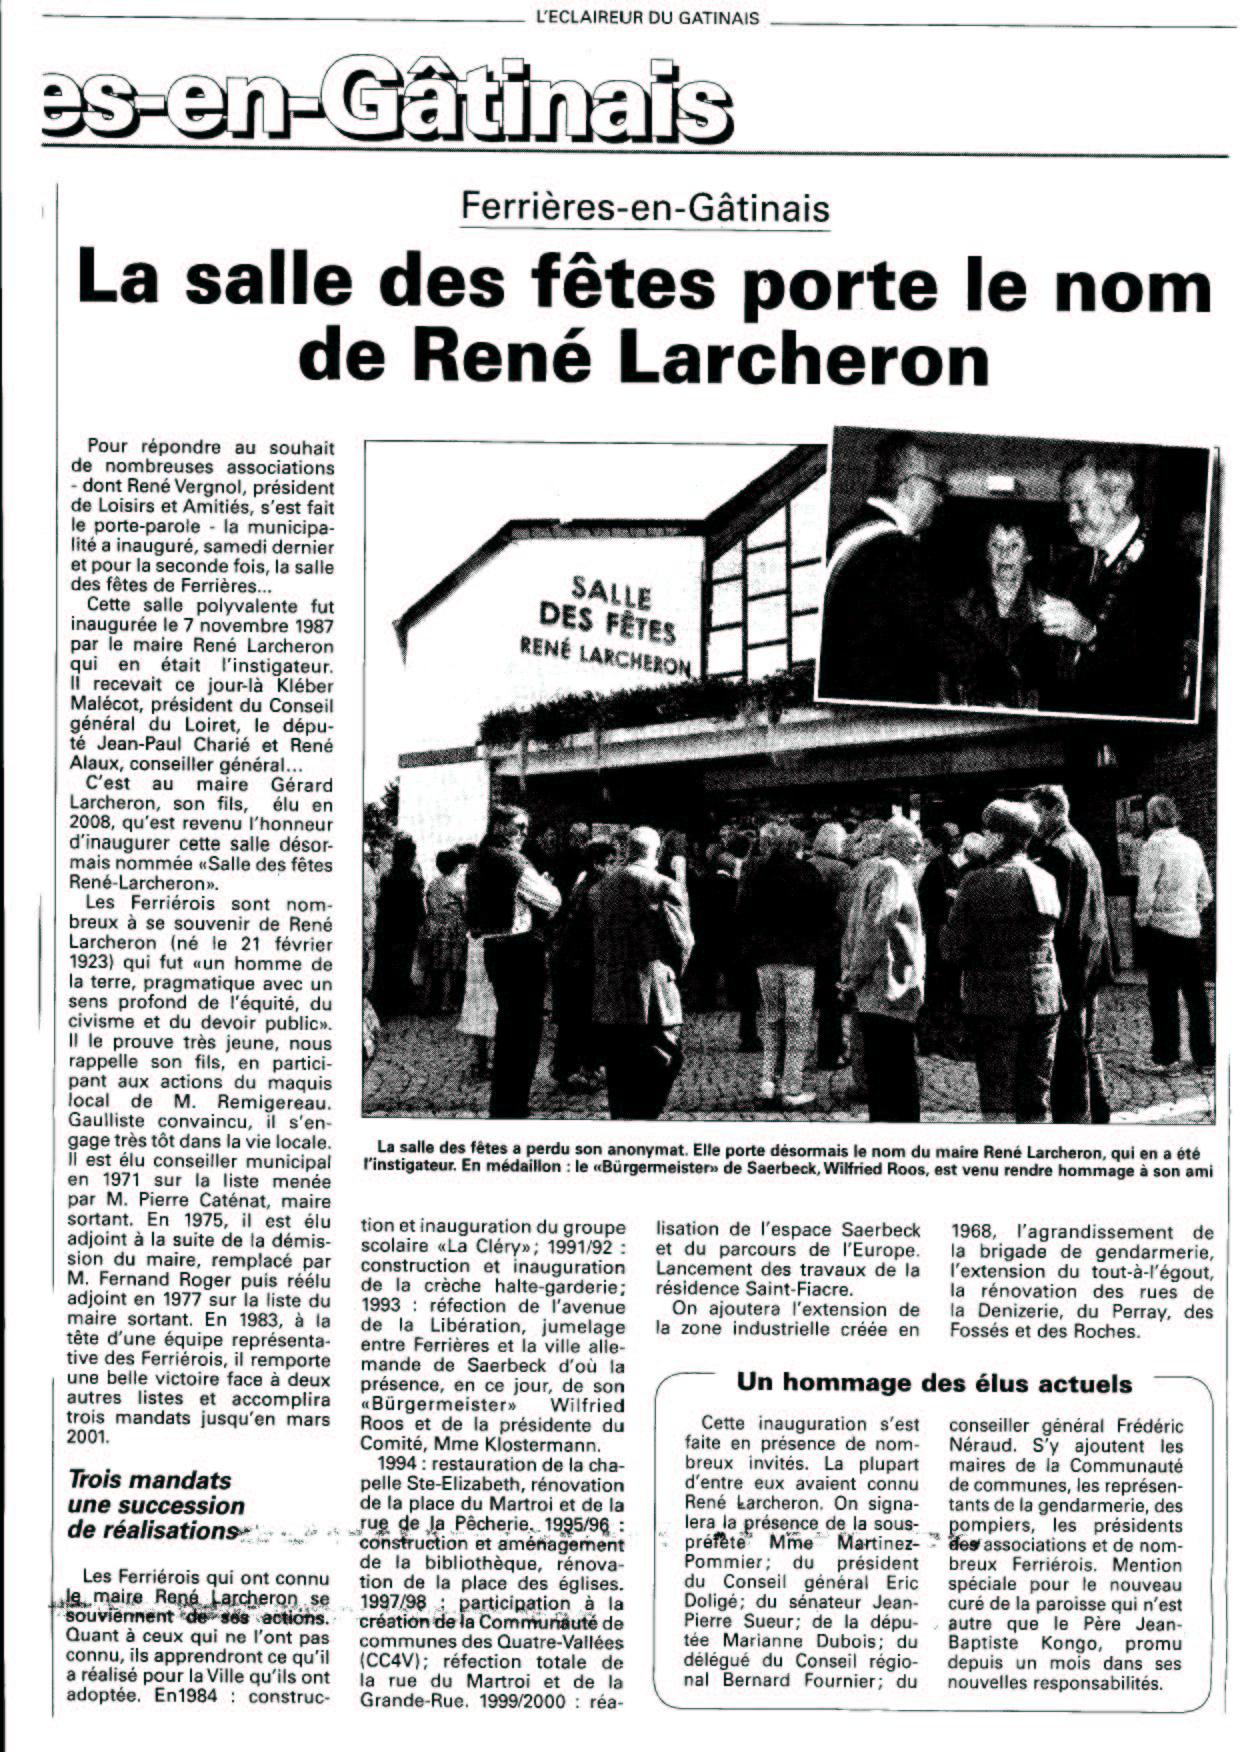 100923_Eclaireur_Ferrieres